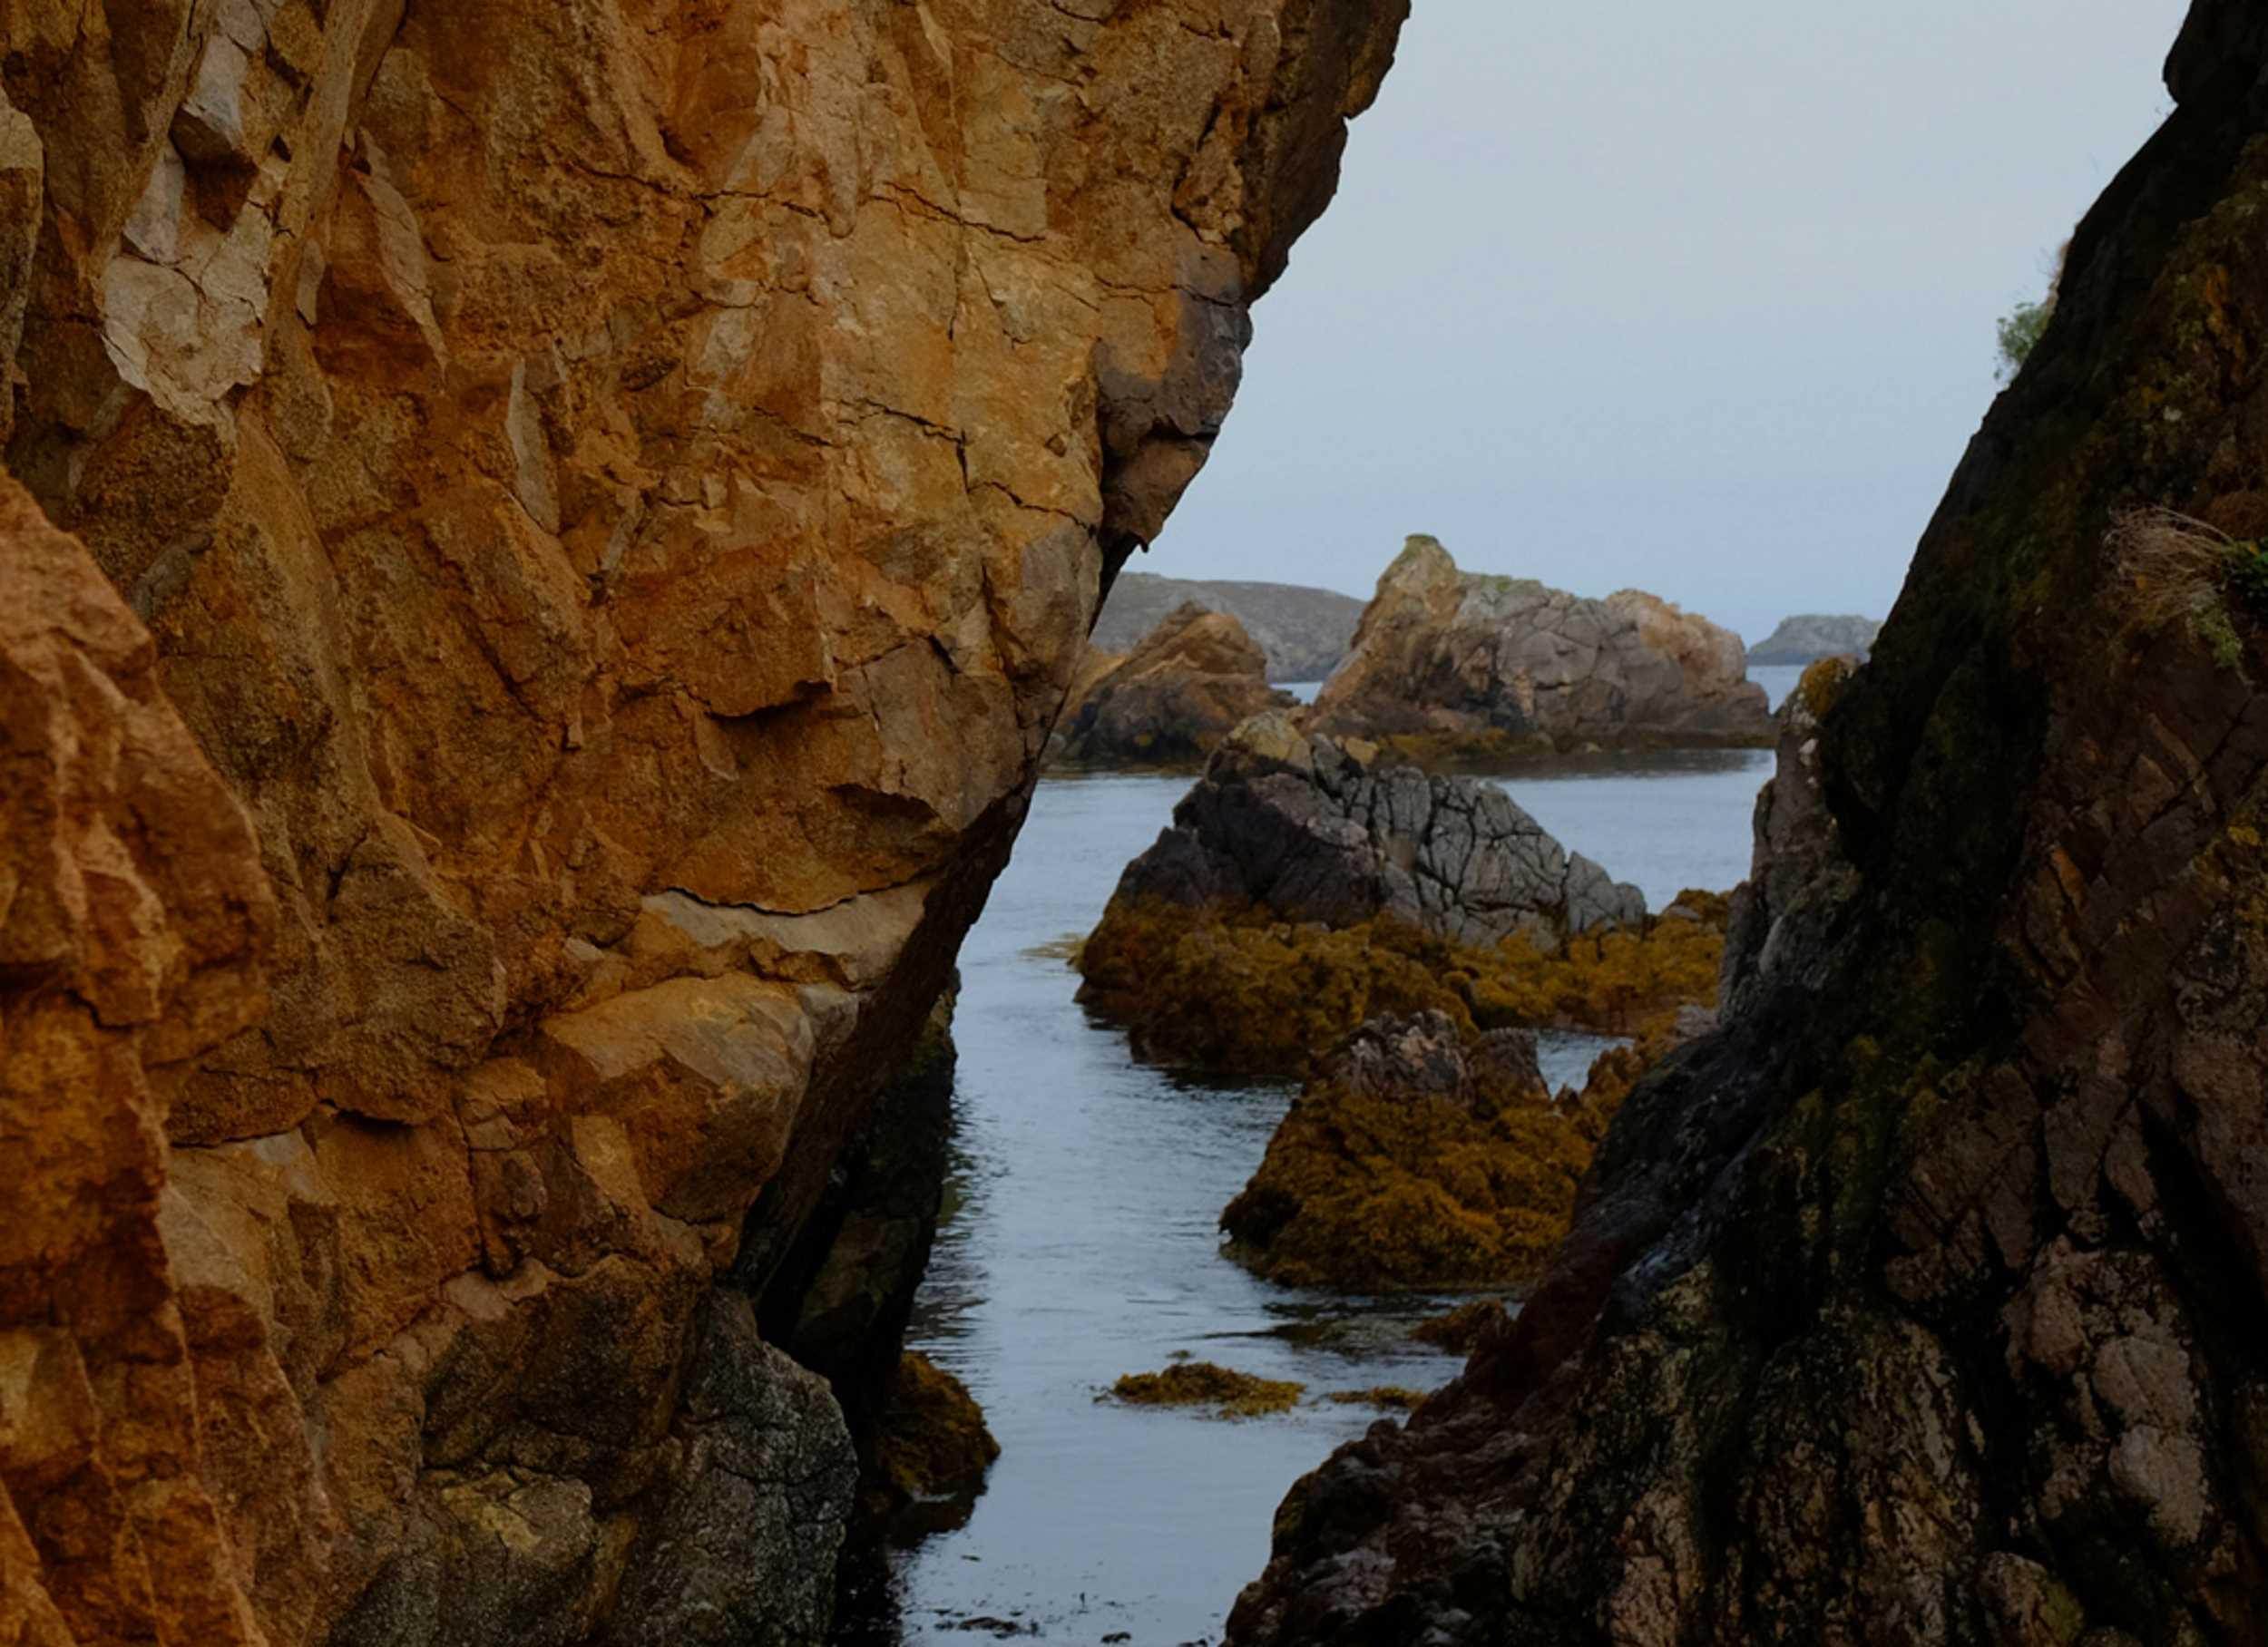 Yann Tiersen Journal Naturaufnahme zum Stück Porz Goret EUSA